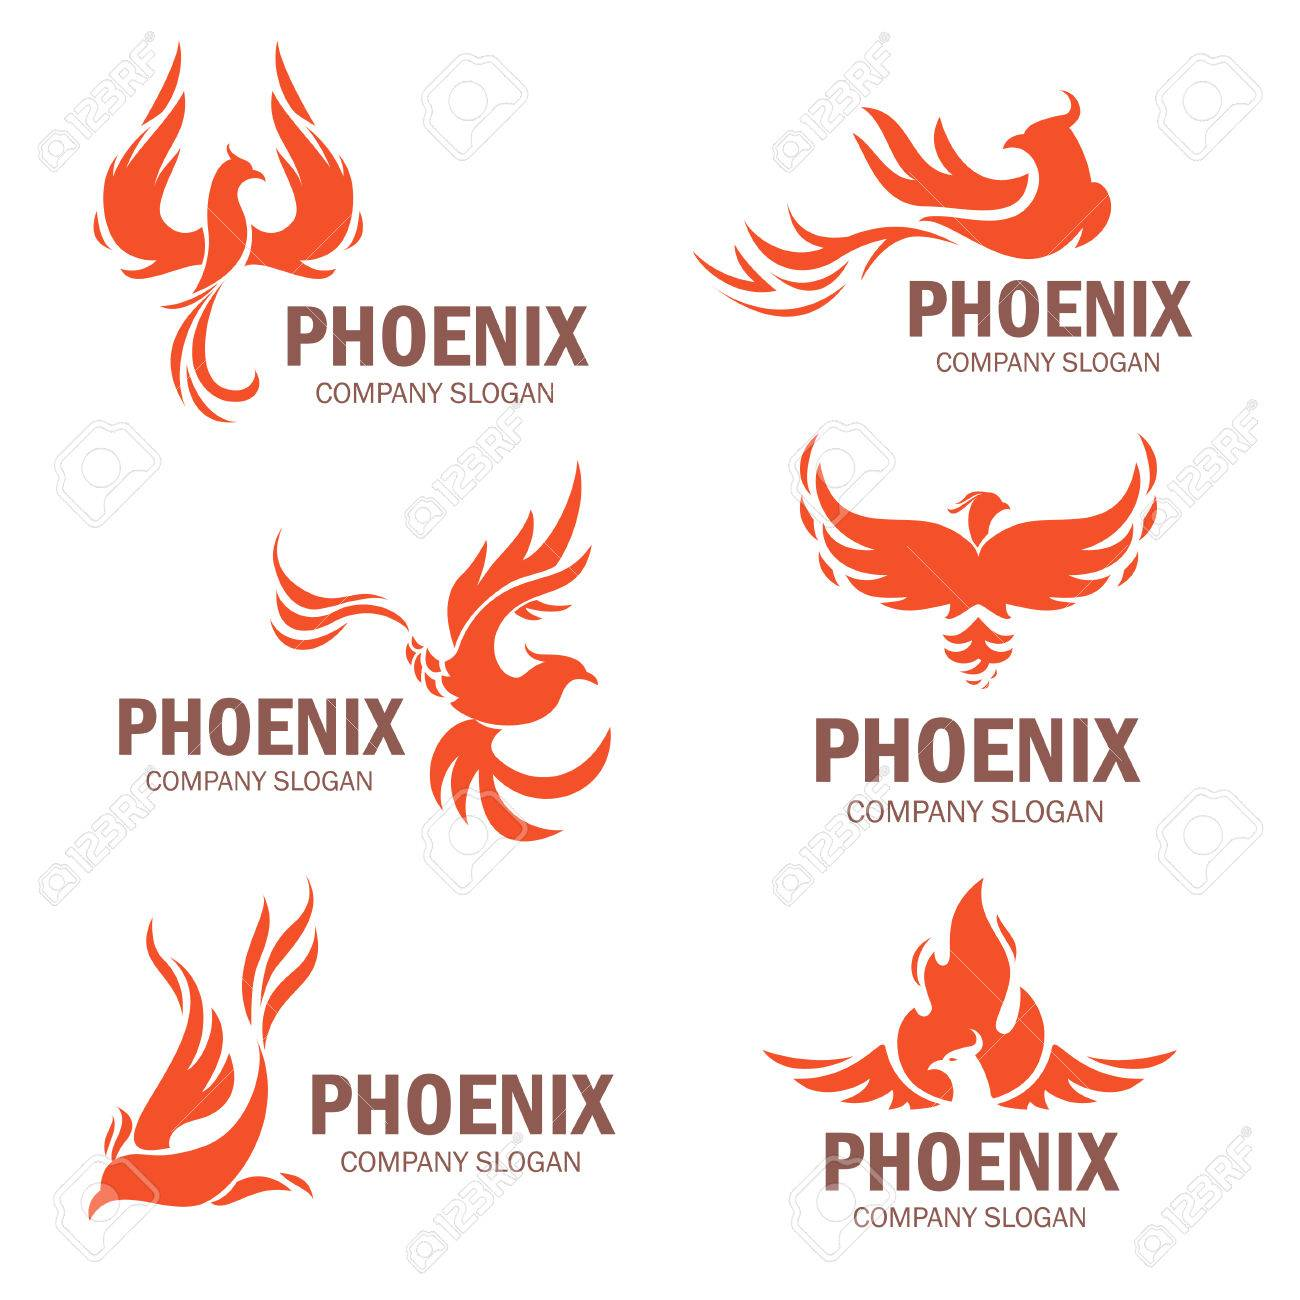 Phoenix Company Slogan Set Rising From The Ashes Bird Symbol